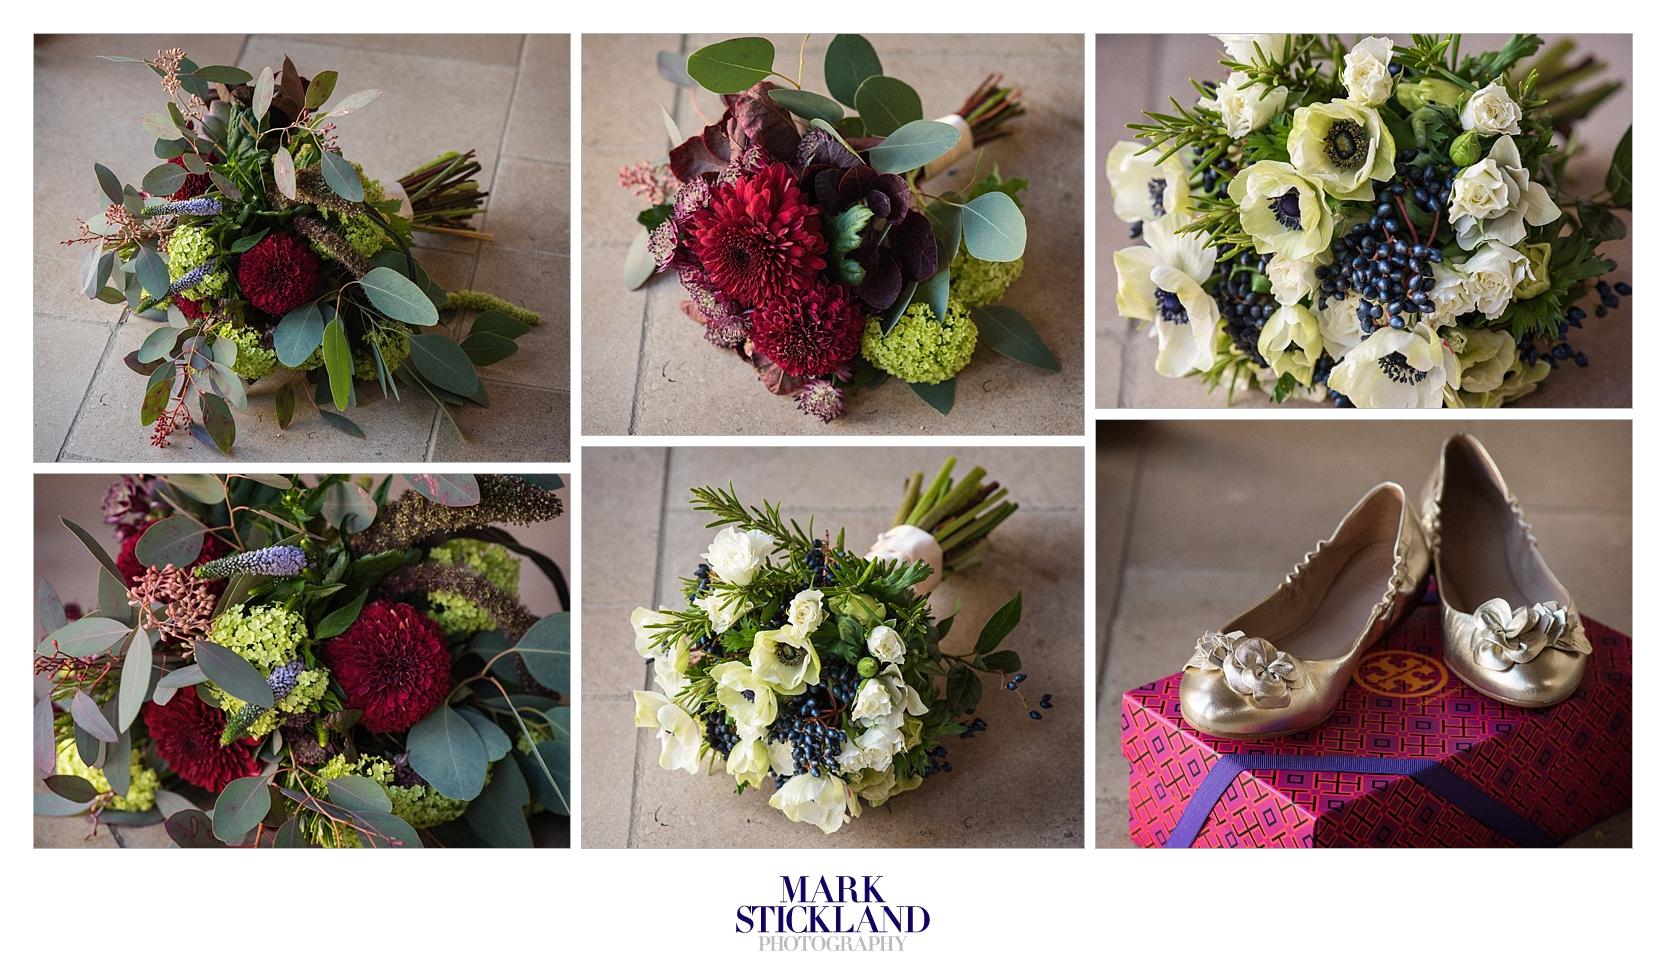 lulworth_castle_wedding_dorset_mark stickland photography.01